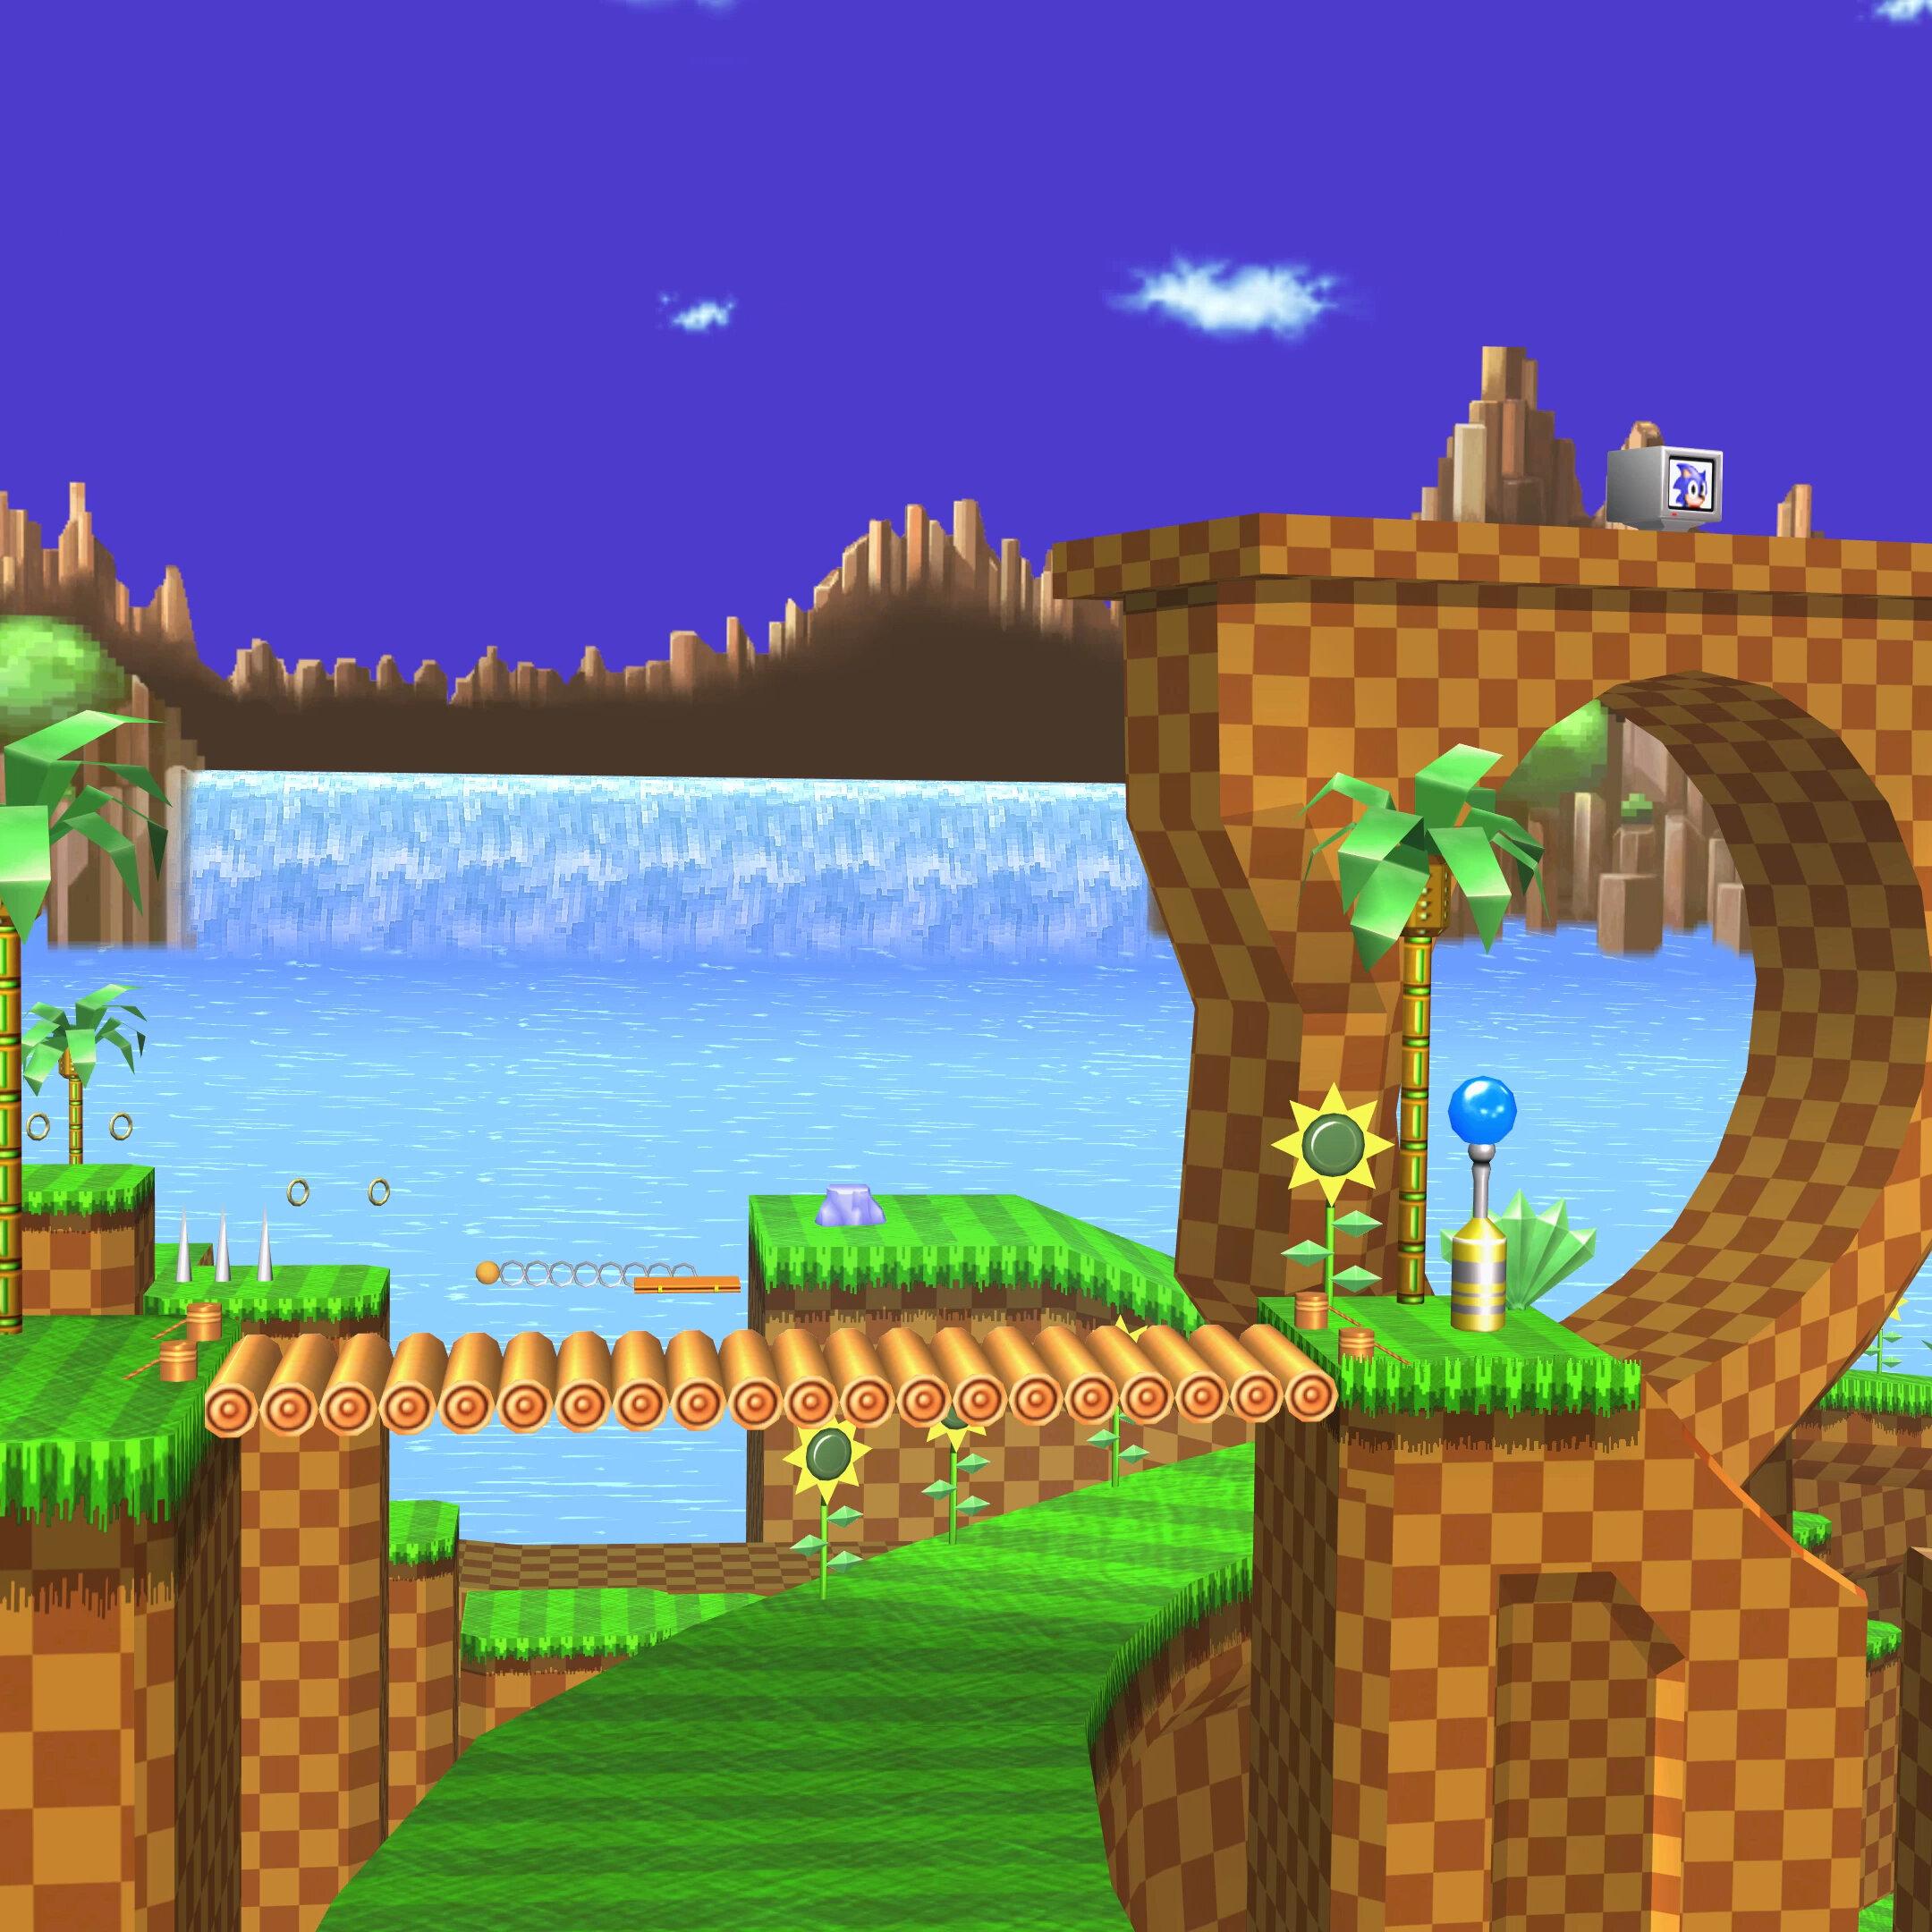 Steam Workshop Vgw 4k Sonic The Hedgehog Green Hill Zone 2